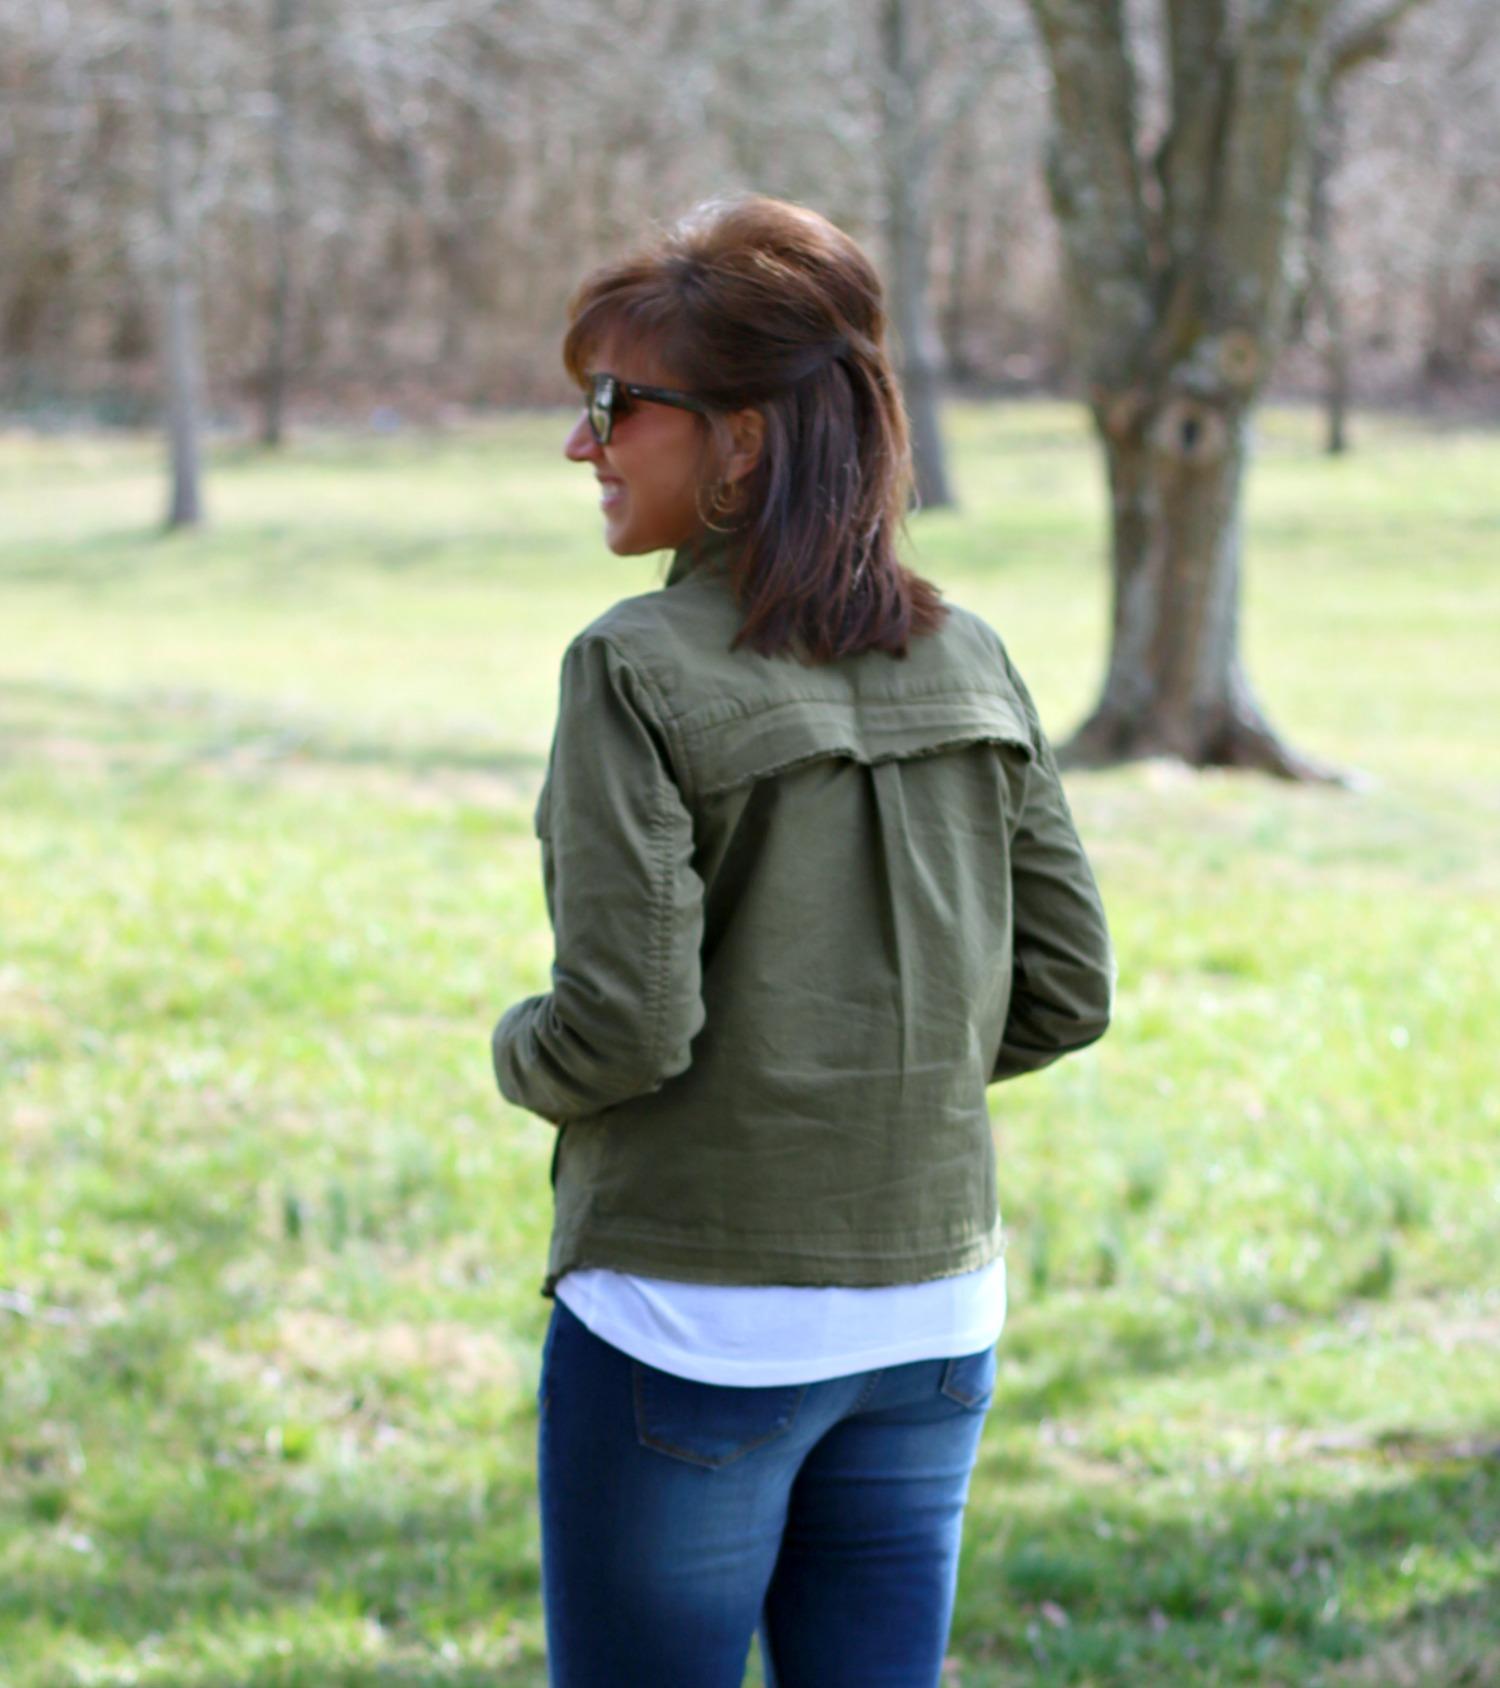 27 Days of Spring Fashion: Utility Jacket